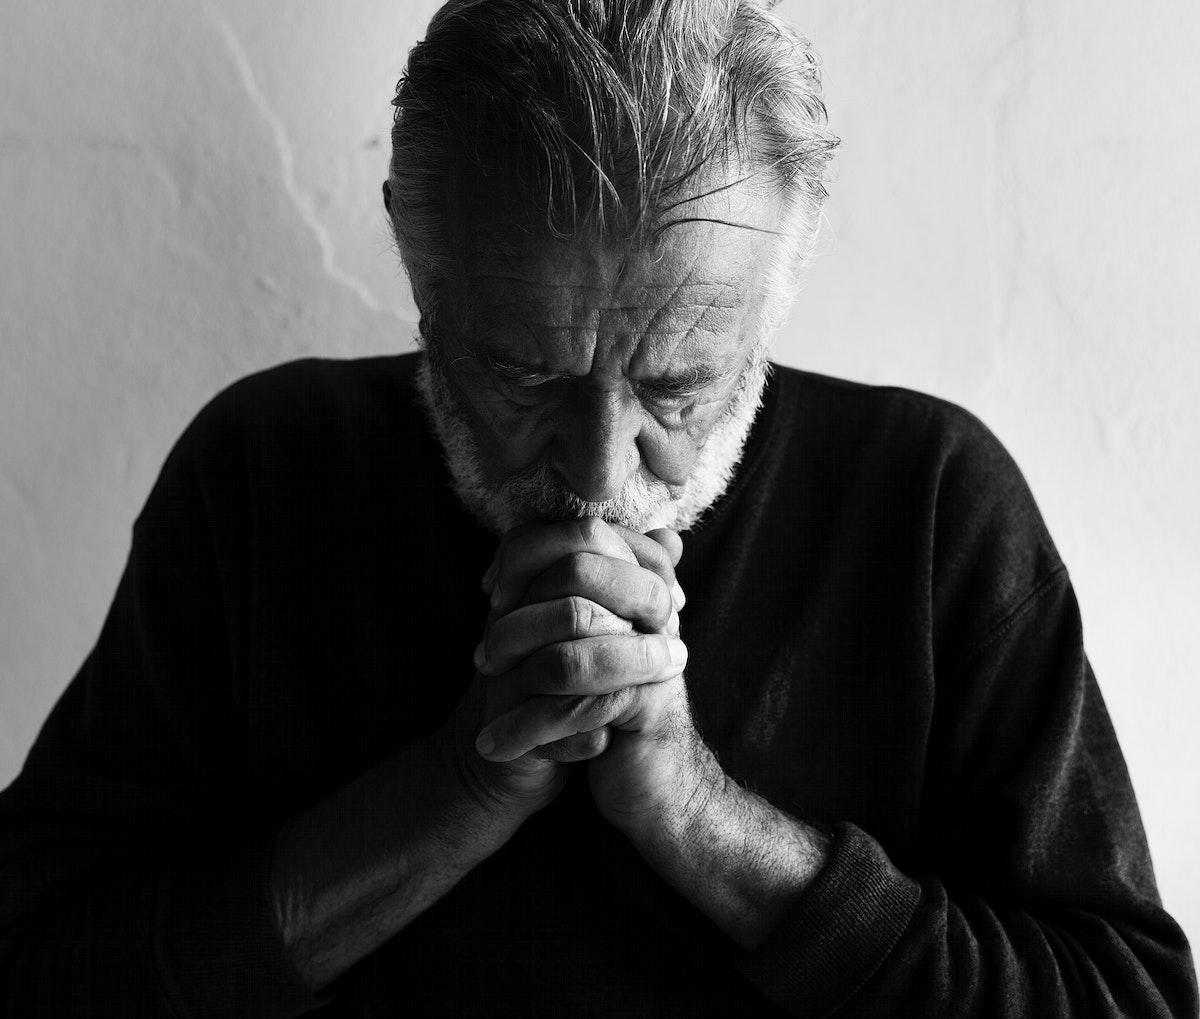 Elderly caucasian man with interlocked fingers